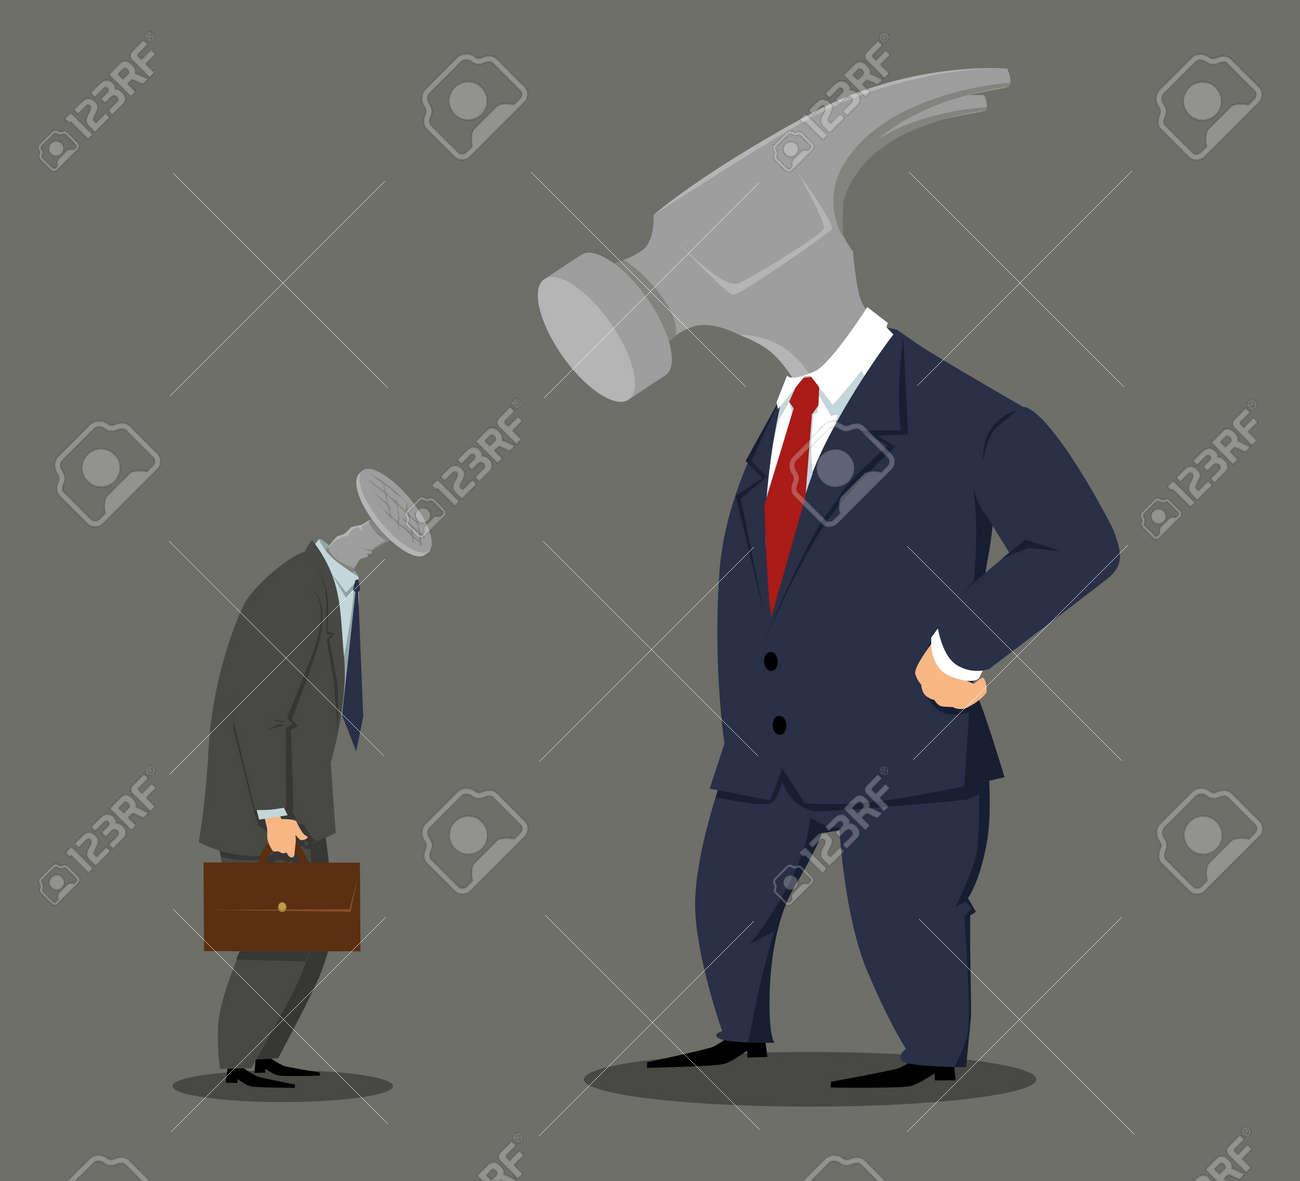 Boss hammer looking at a nail employee, EPS 8 vector illustration - 89536917